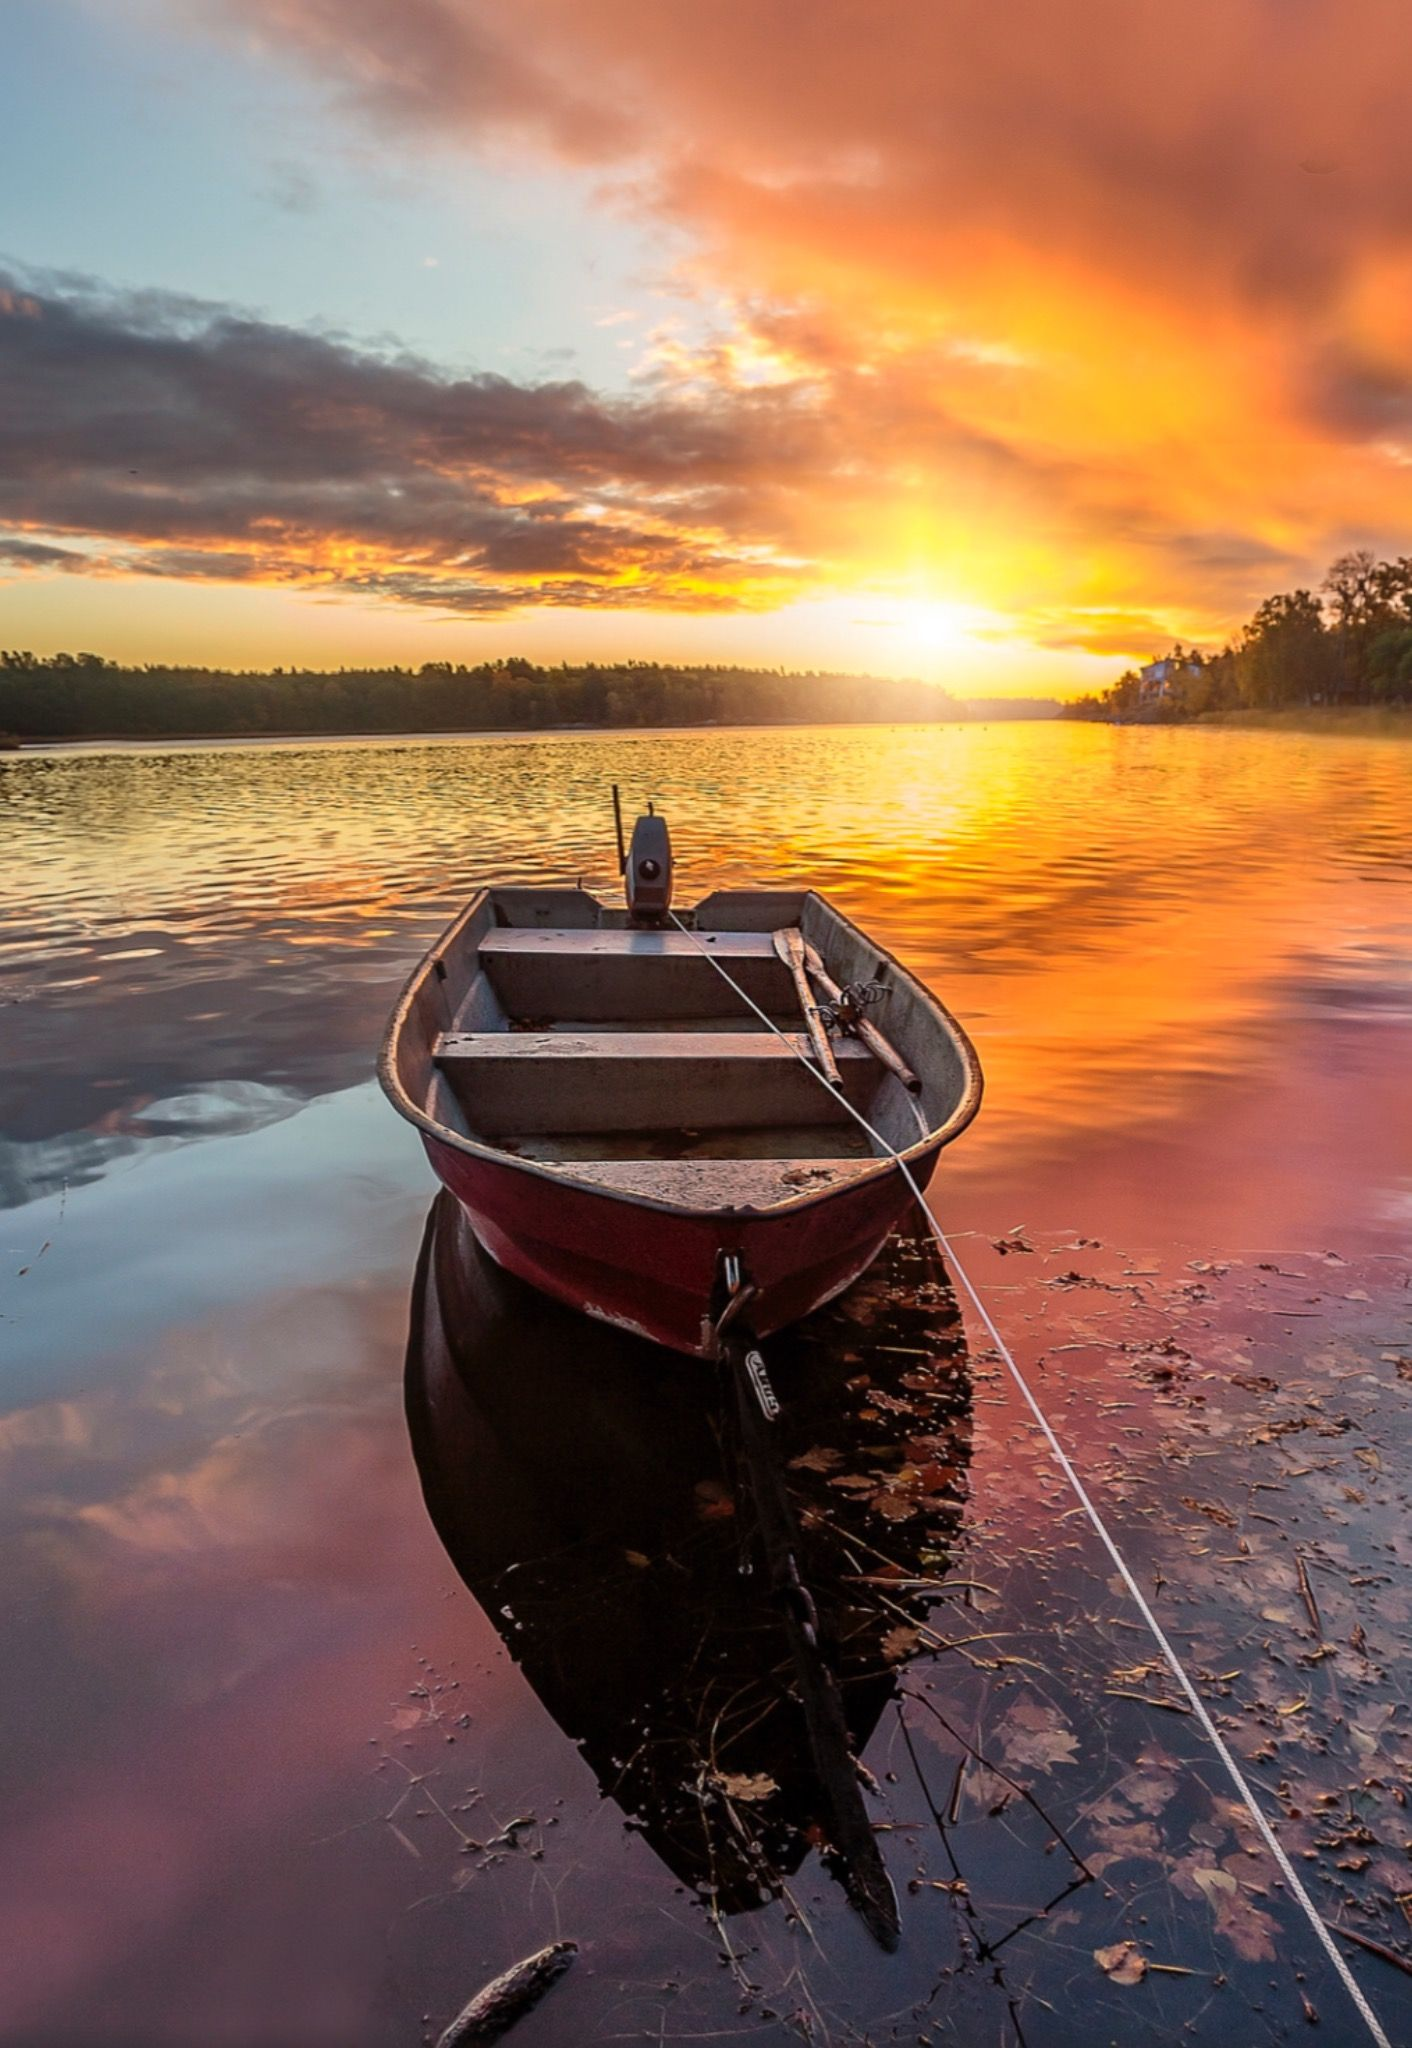 Sunset, Boat. Photo by kennet brandt. Source Flickr.com ...